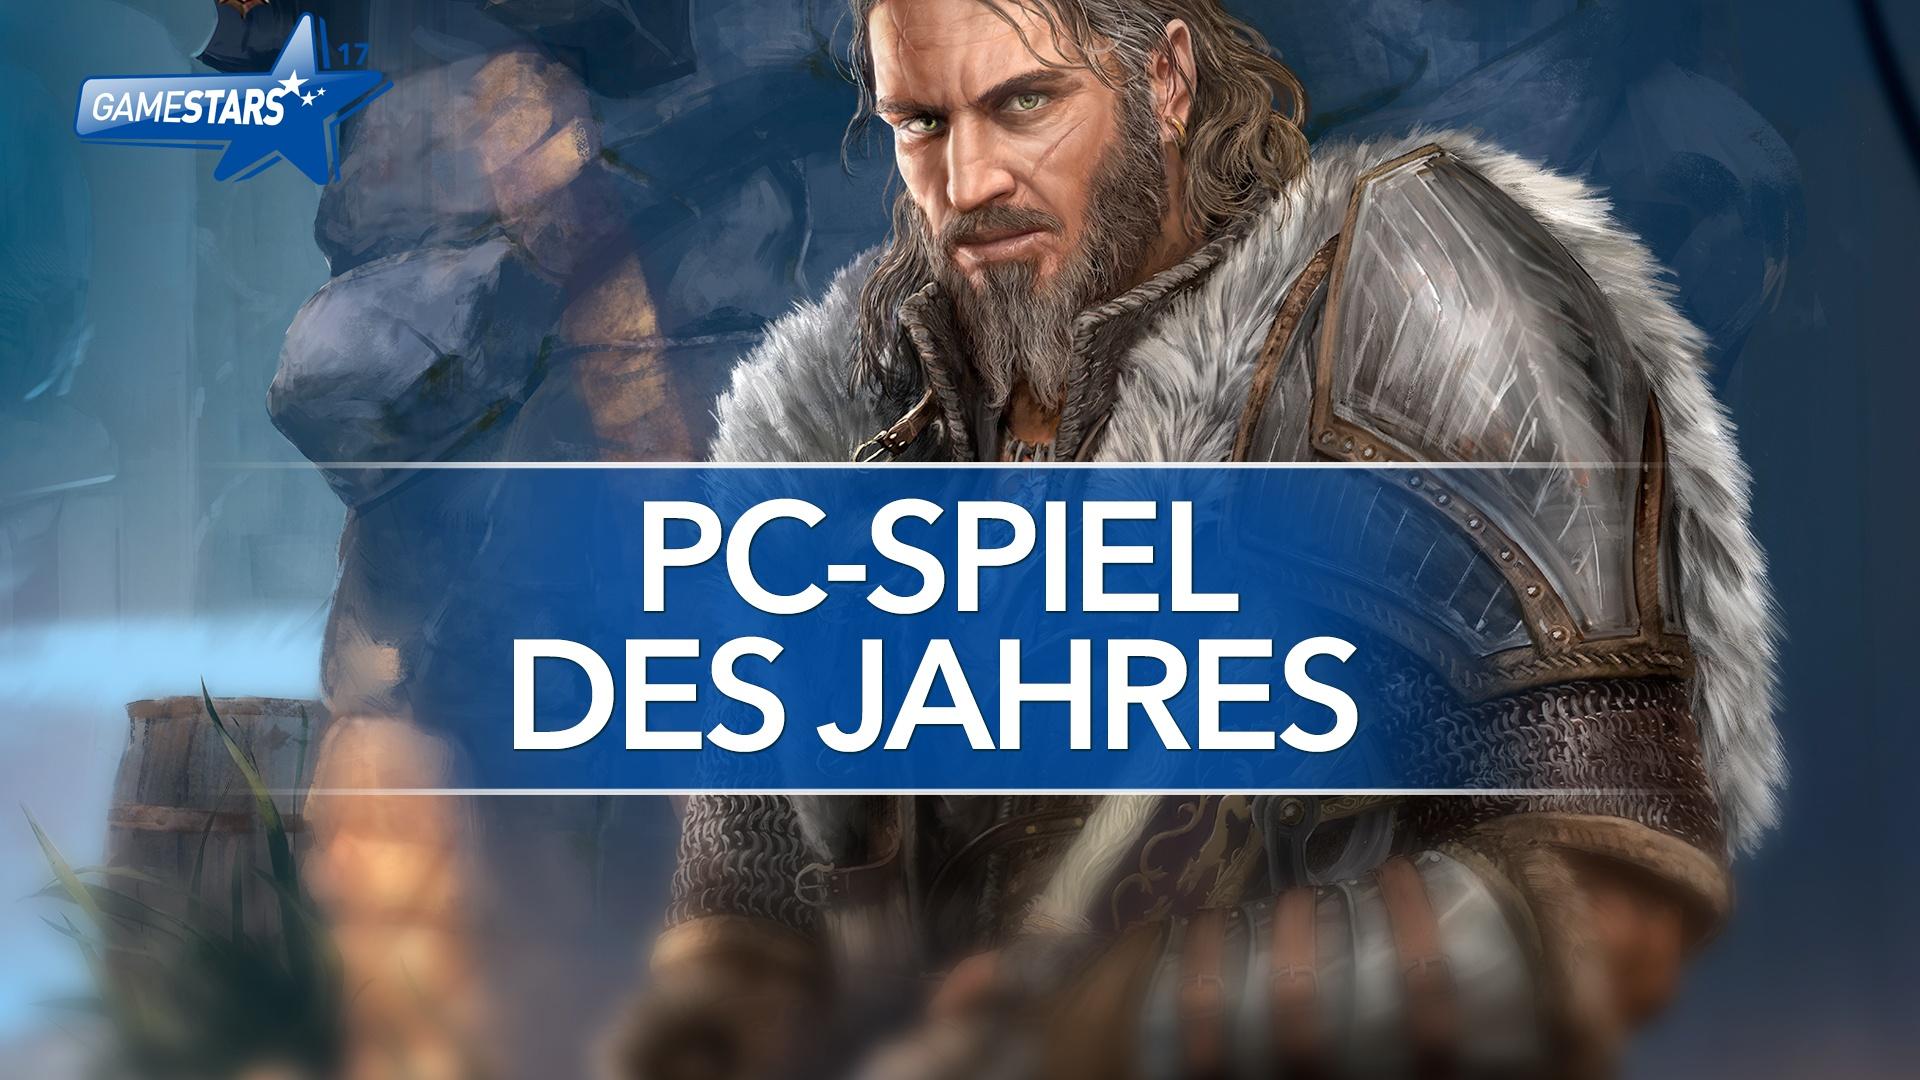 Bestes online game